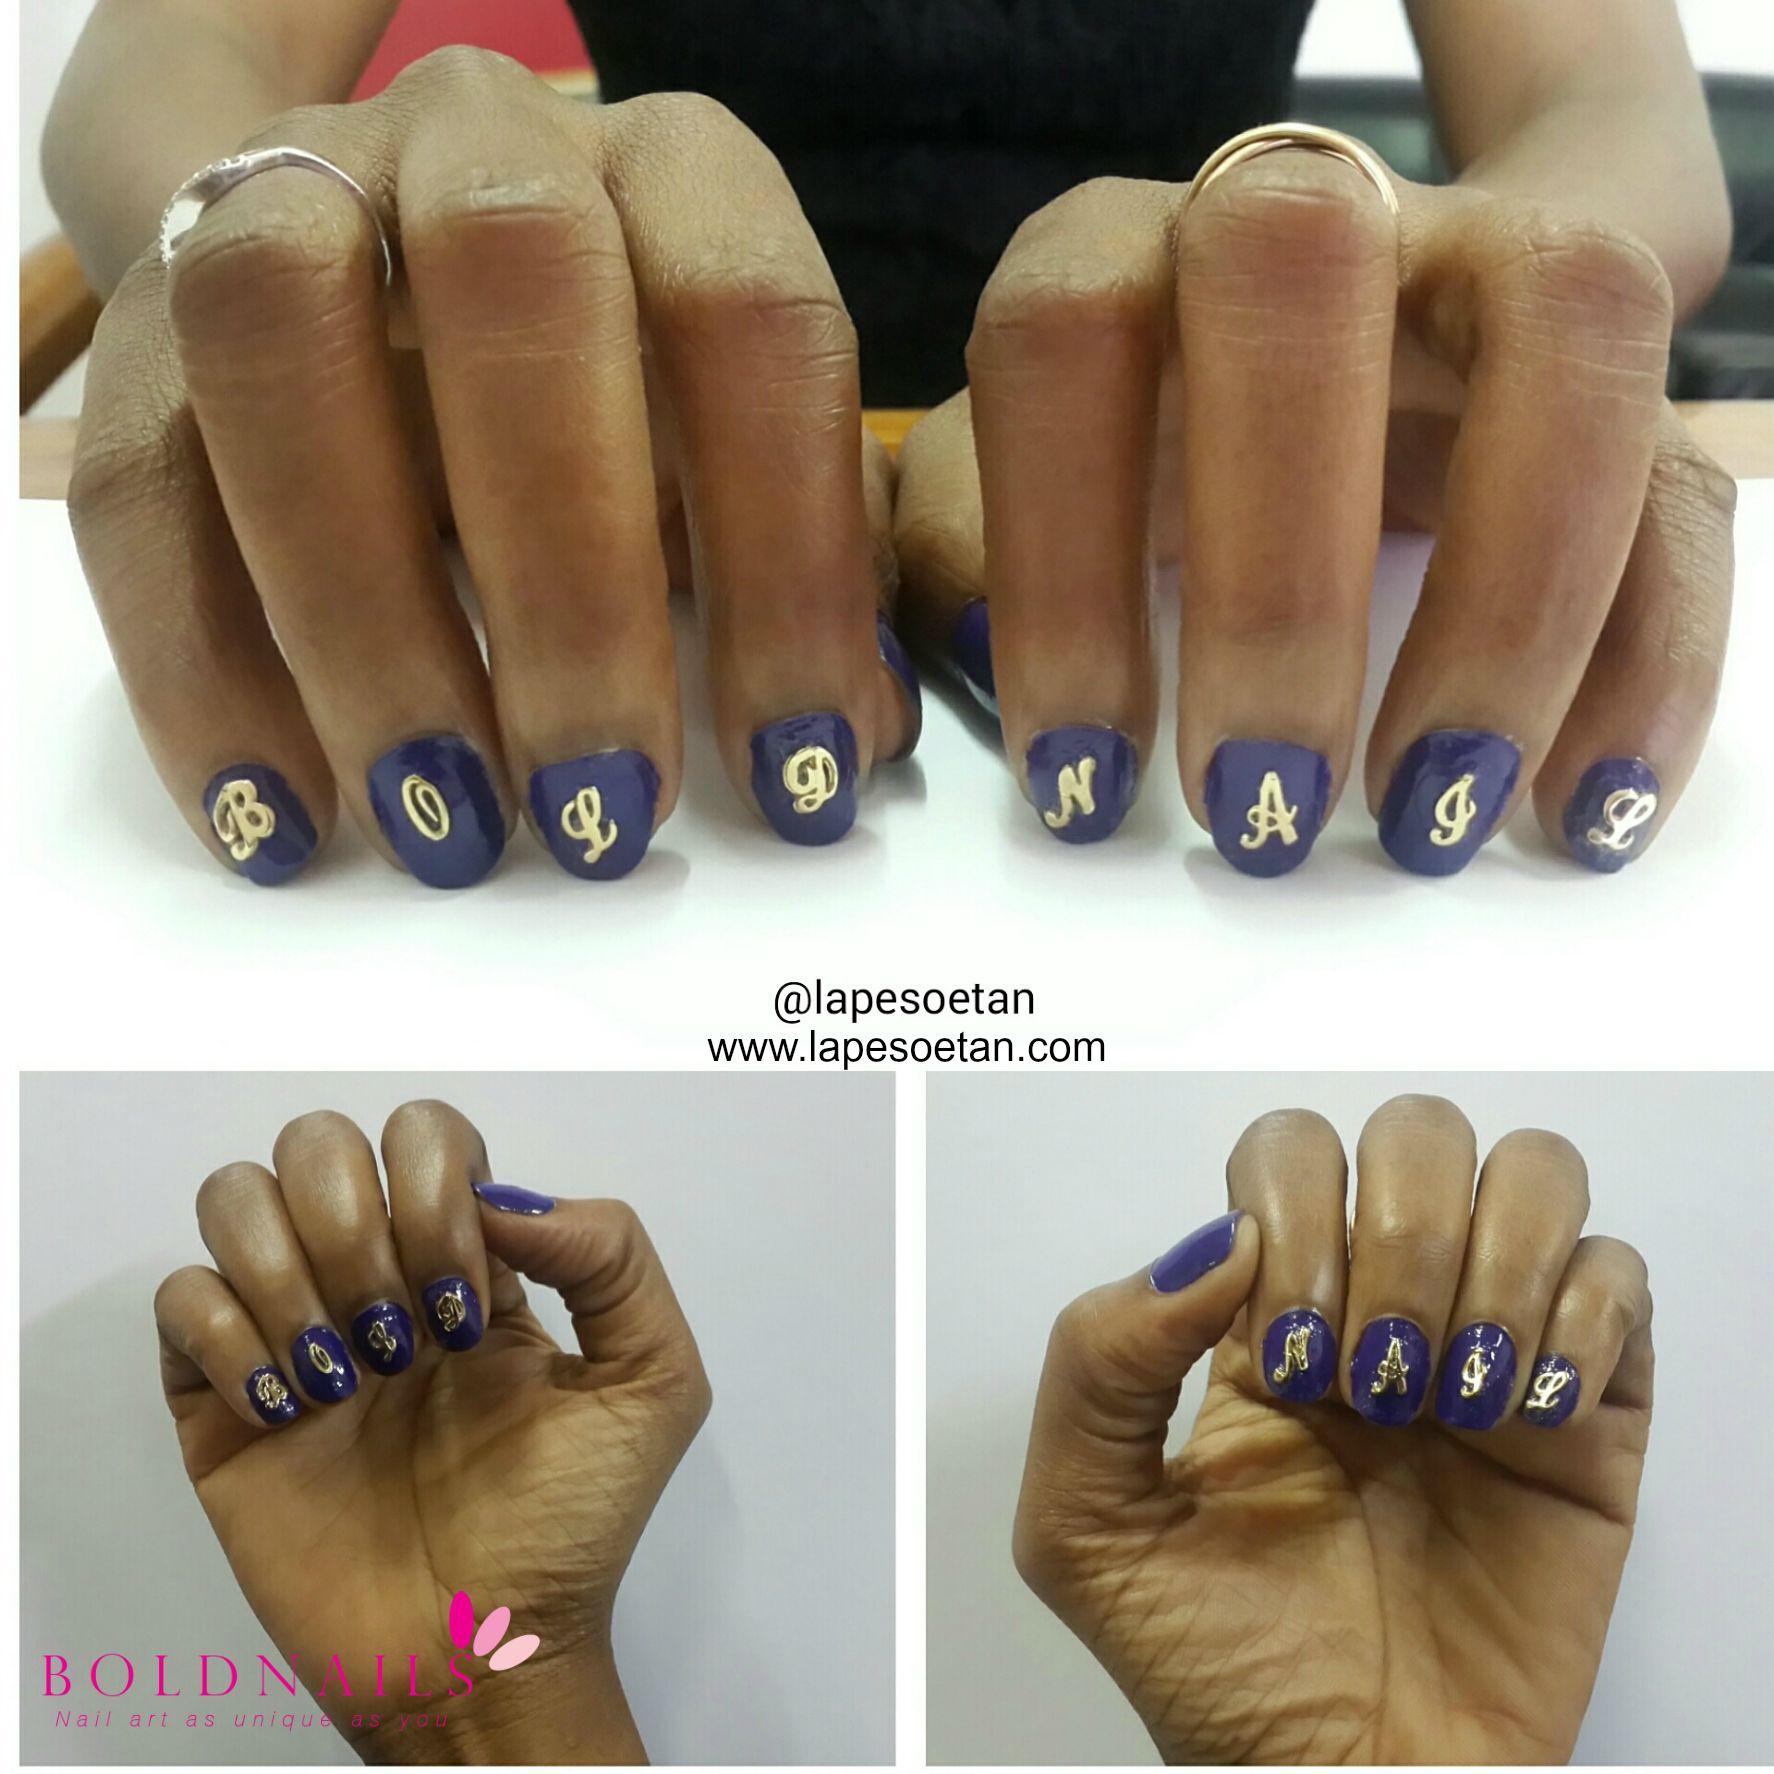 Nail Art Bold Nails Lape Soetan